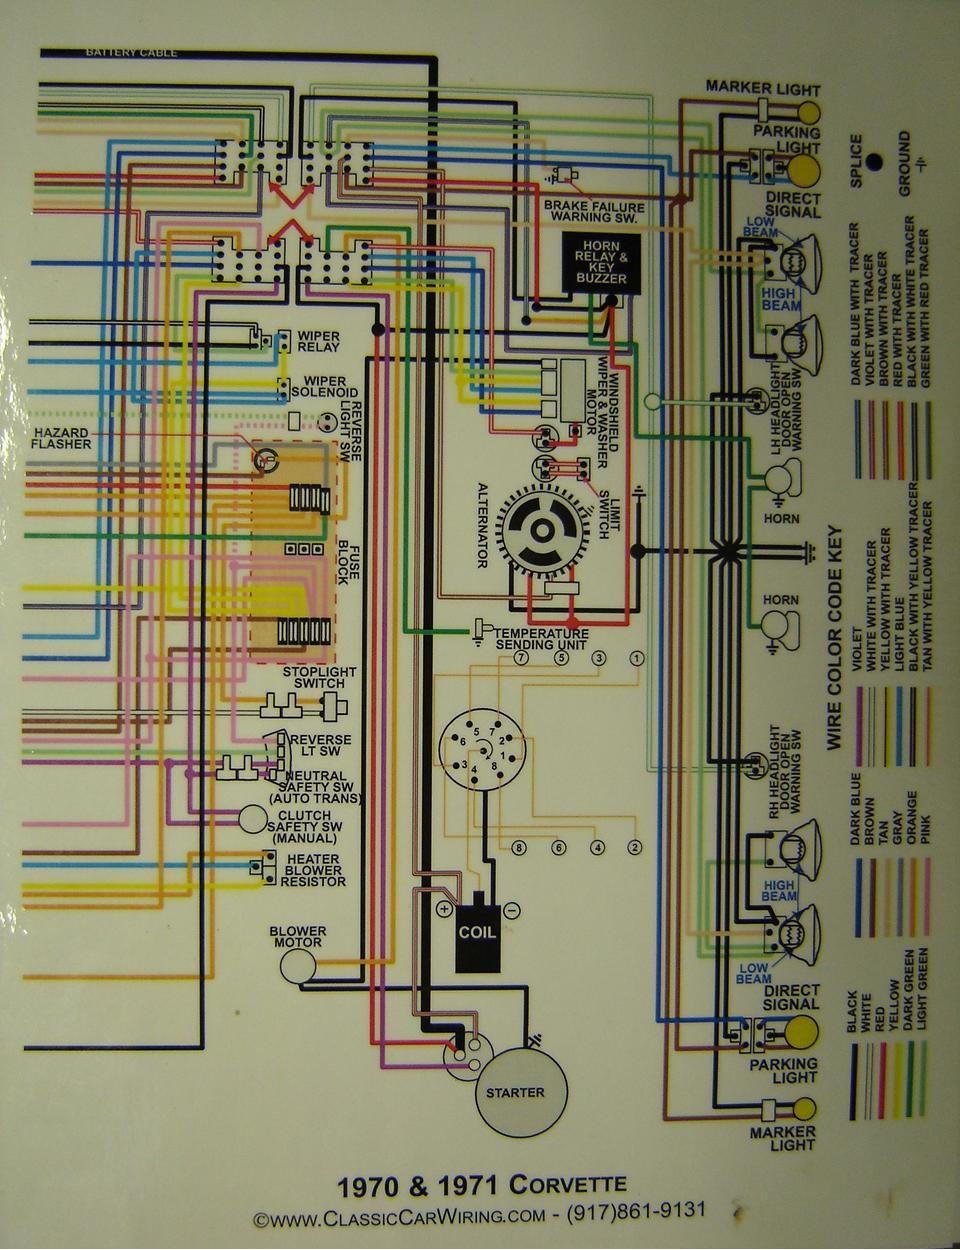 Corvette Wiring Guide - Data Wiring Diagram Schematic - Mercury Outboard Wiring Harness Diagram